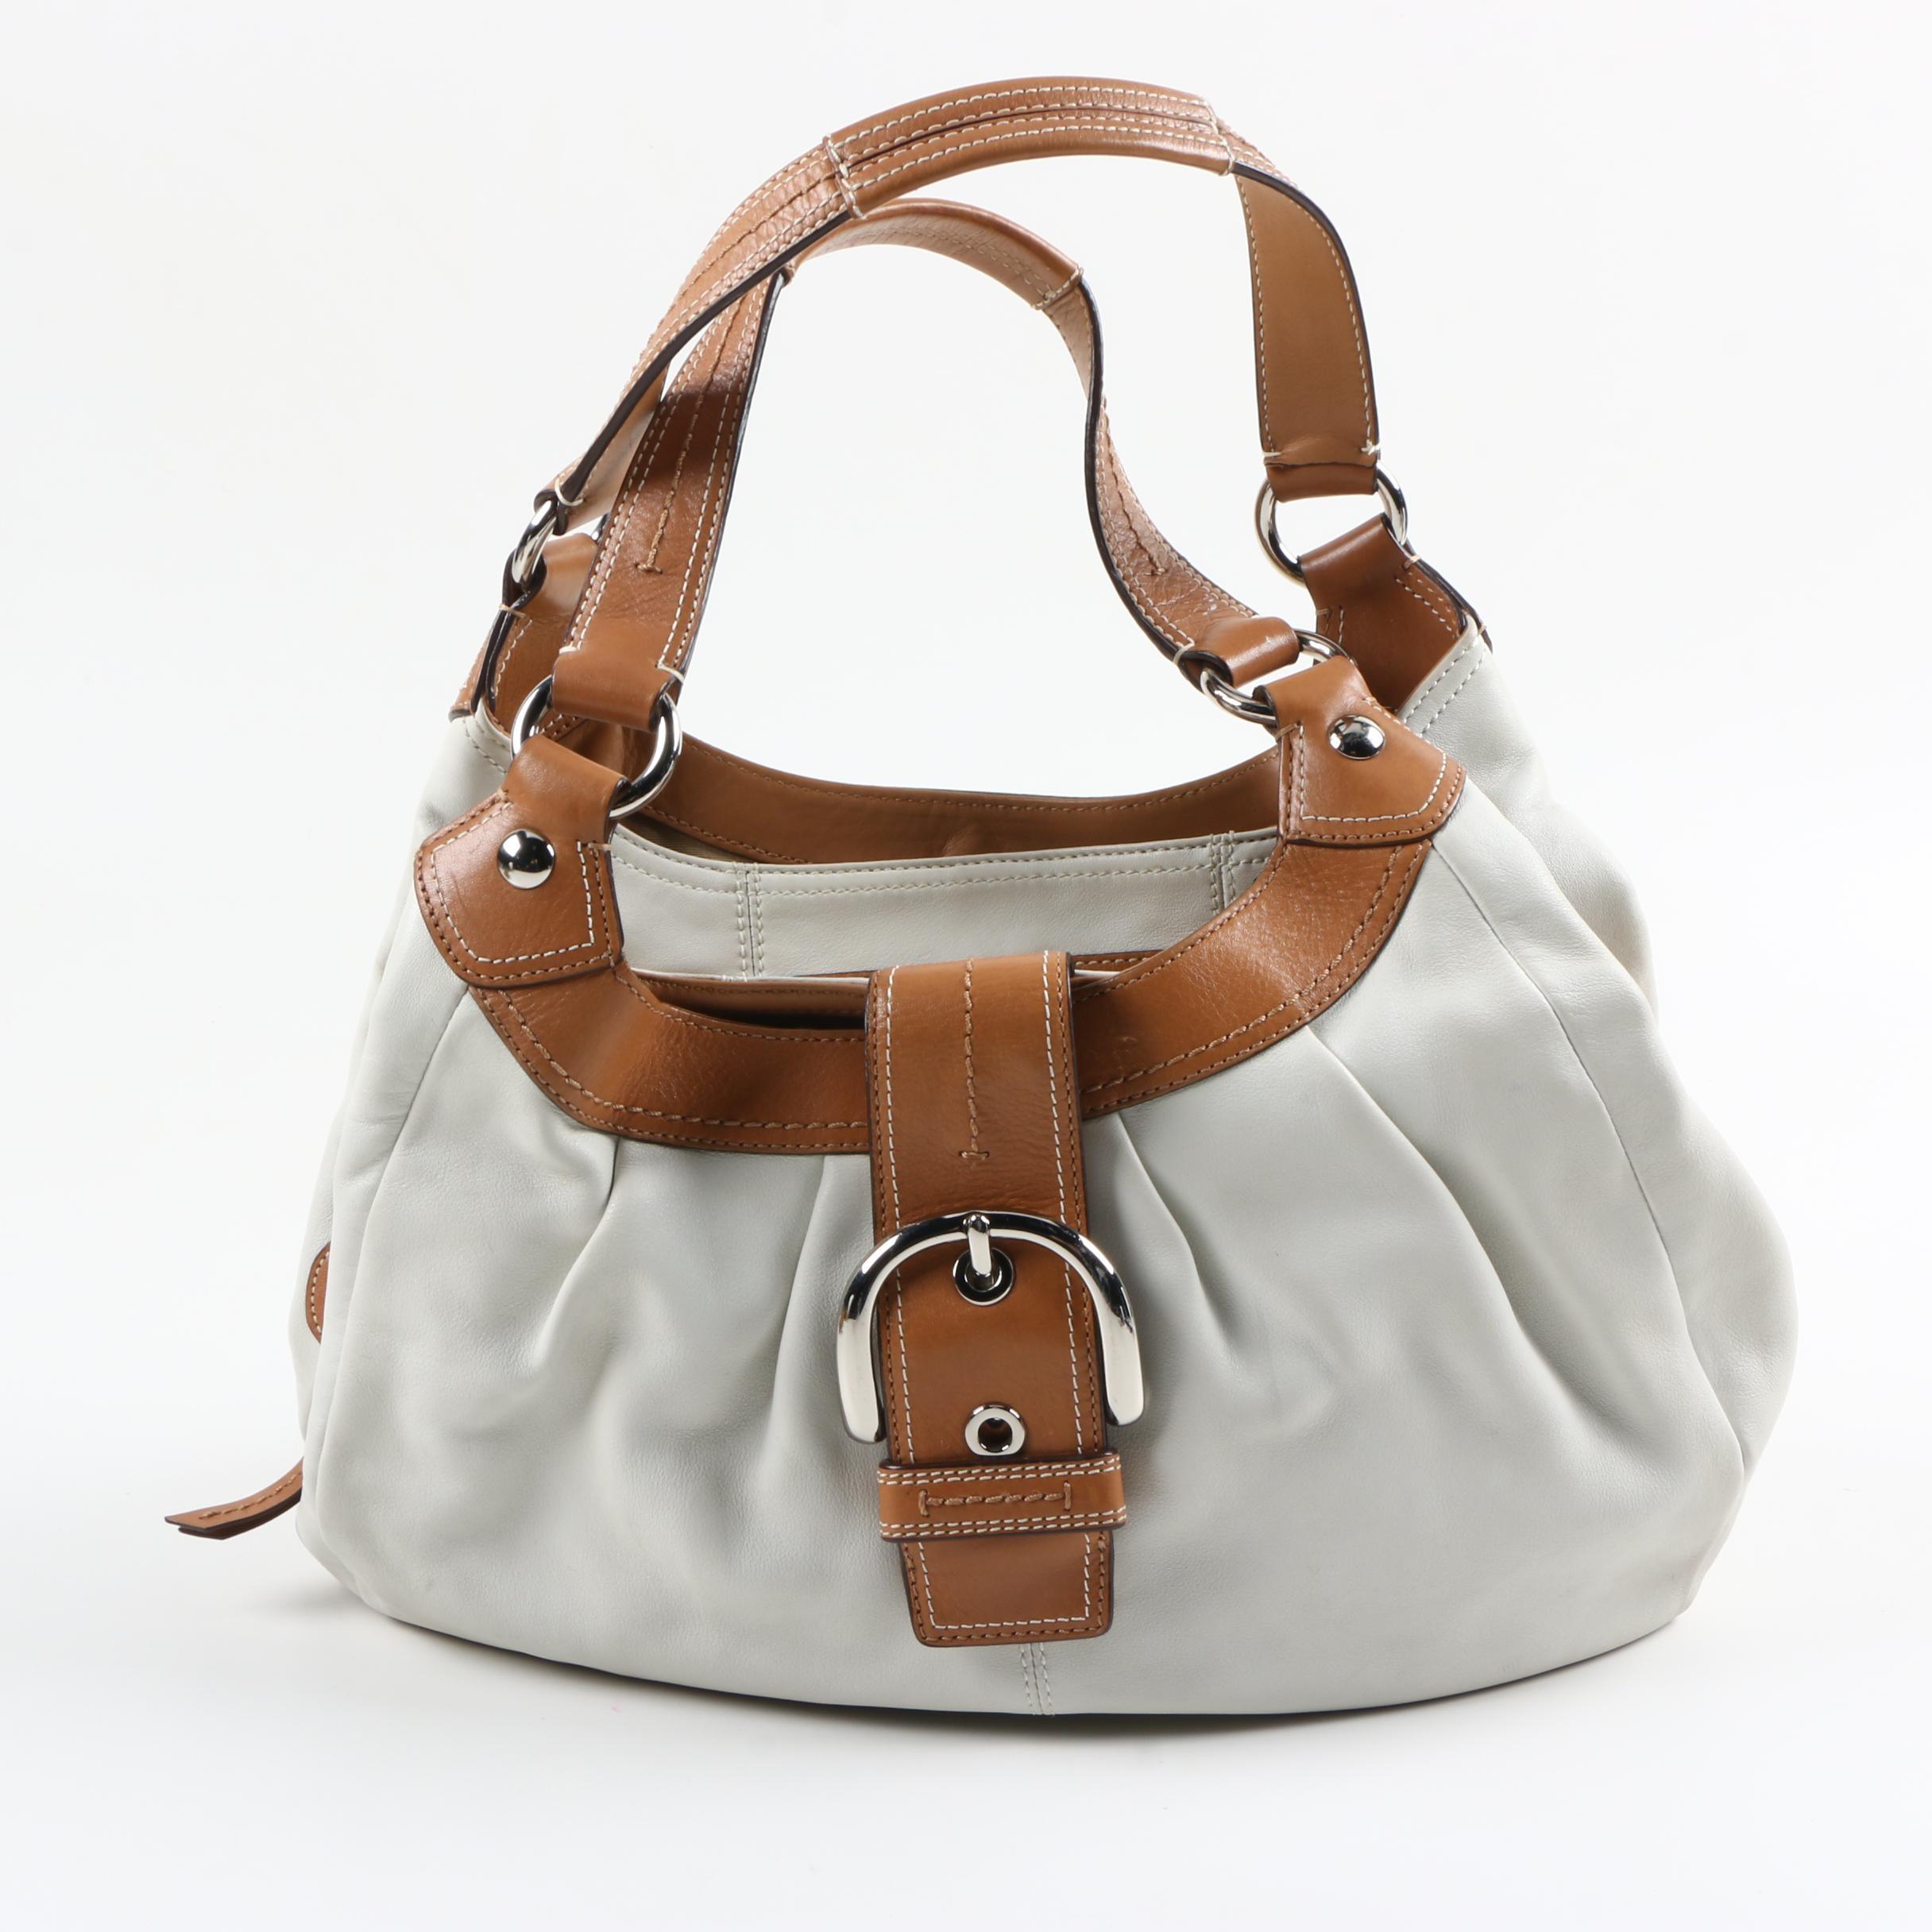 Coach Leather Soho Hobo Bag